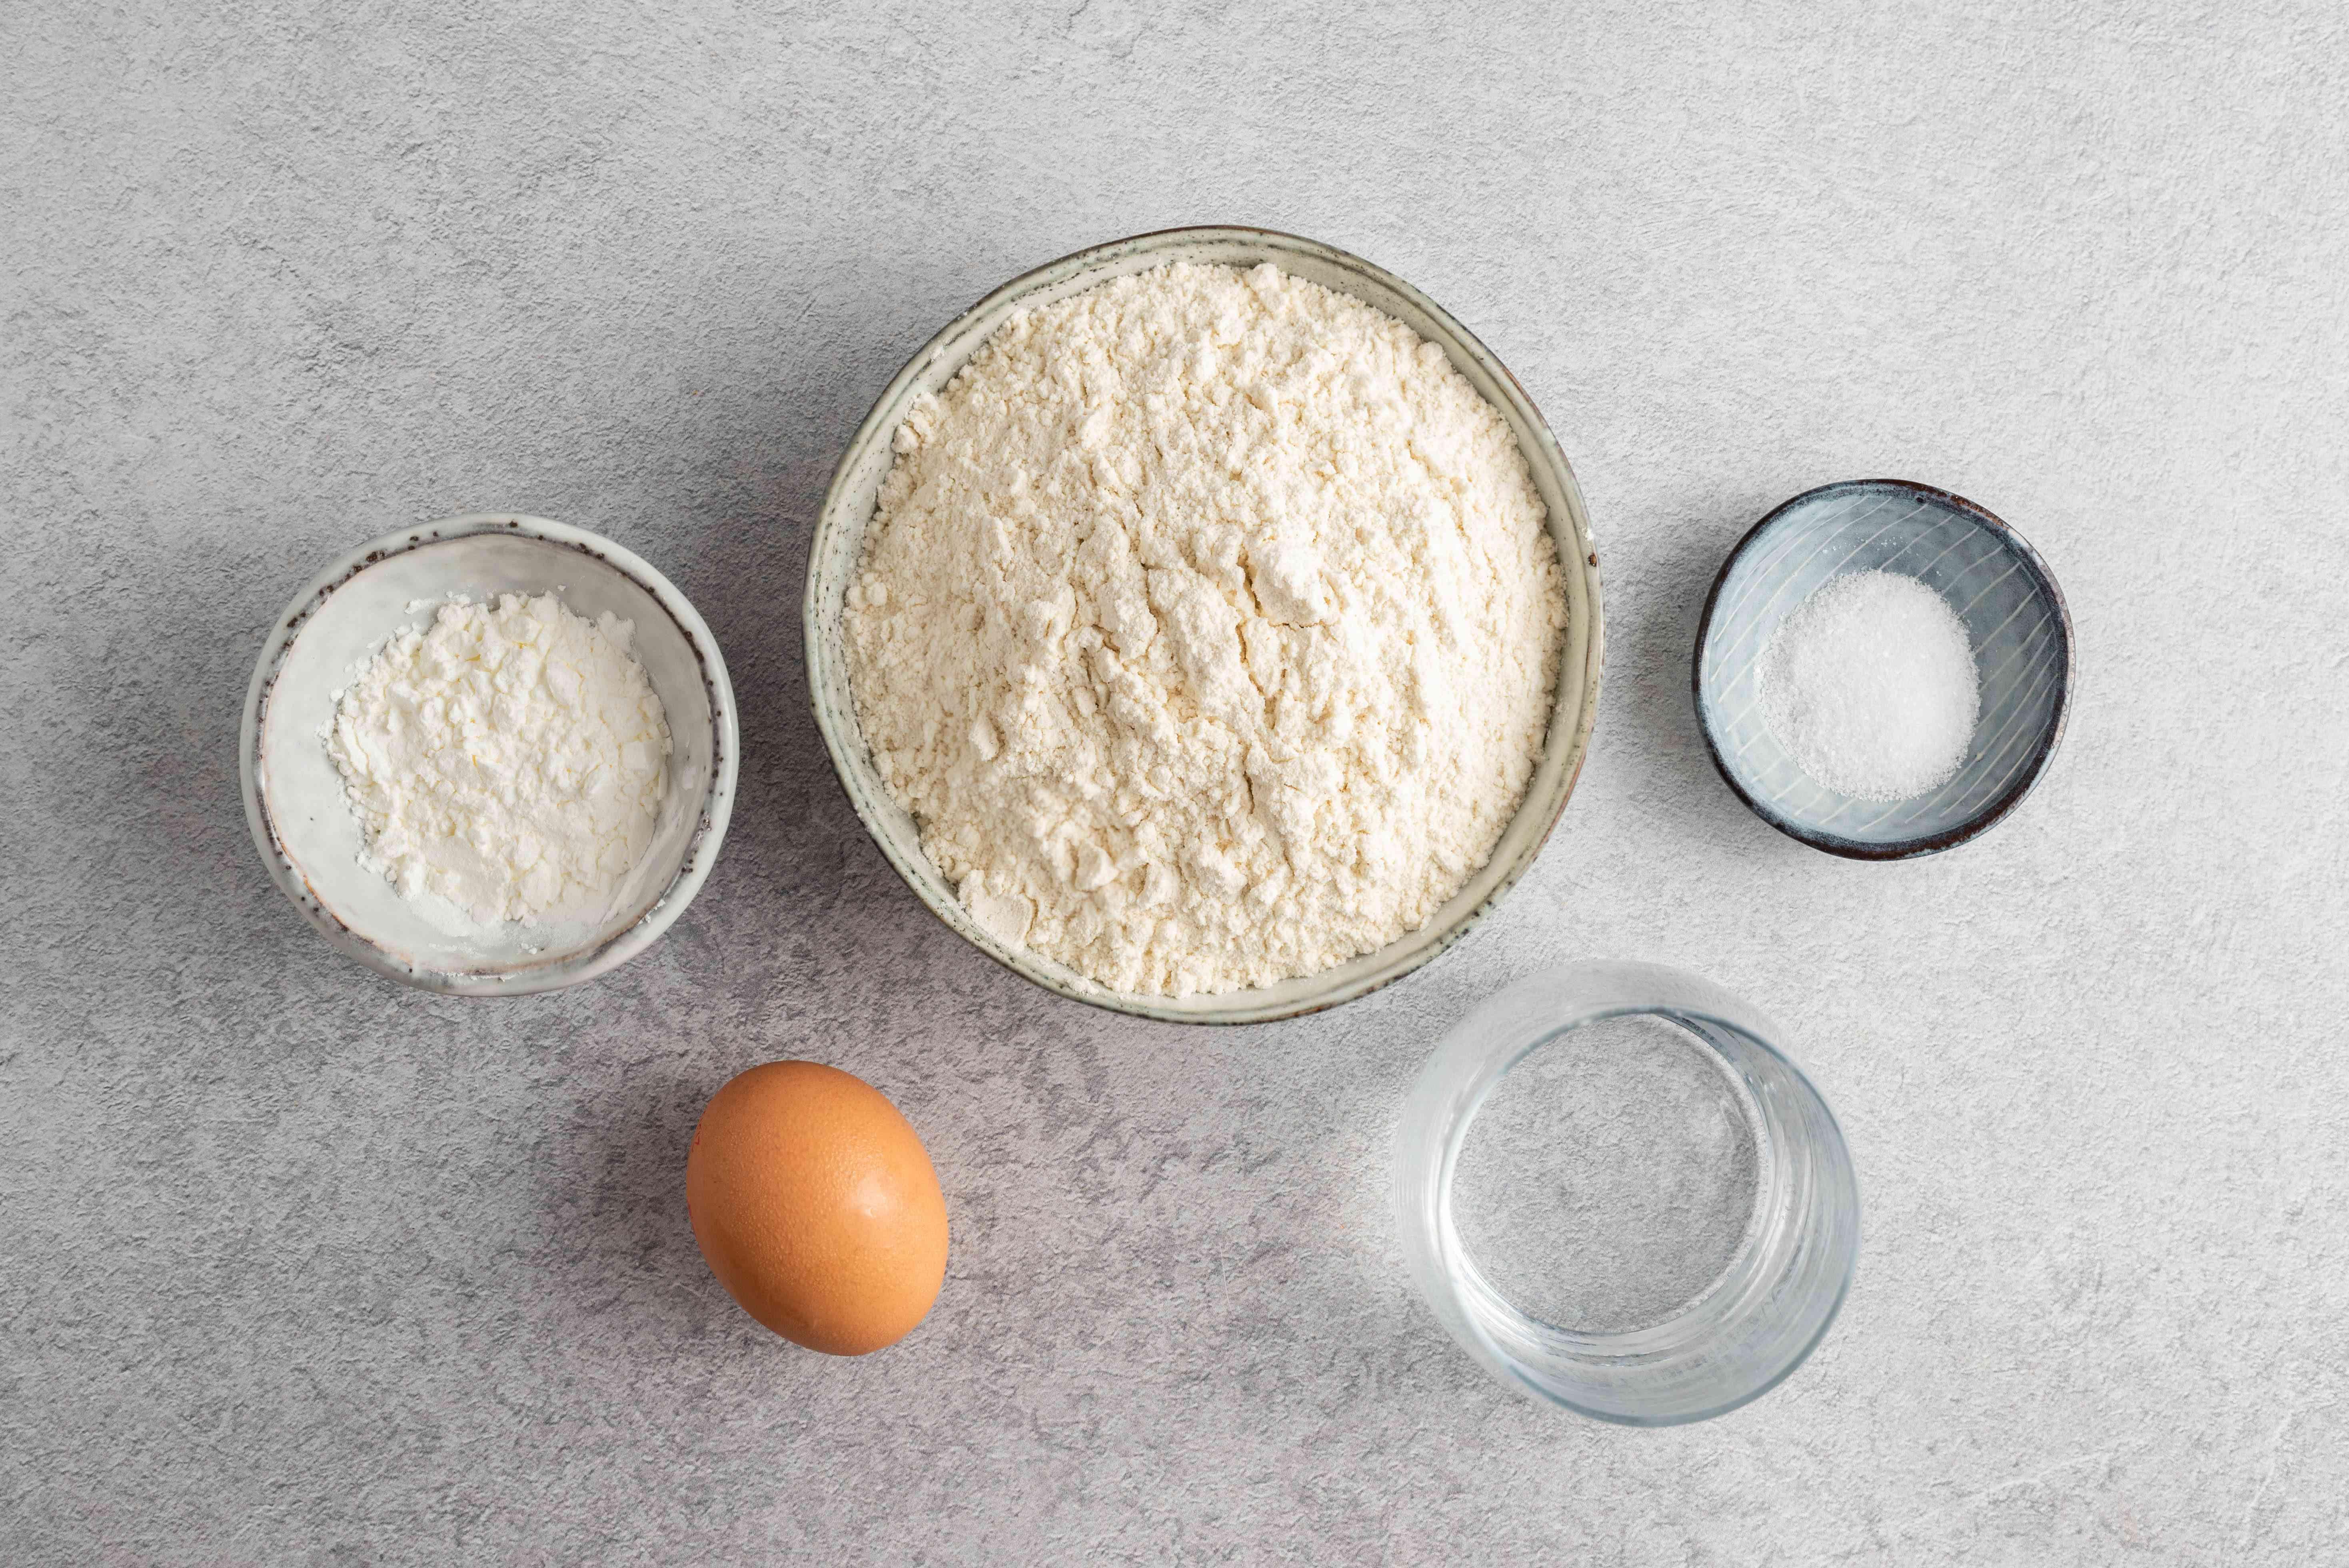 Uncooked eggroll ingredients